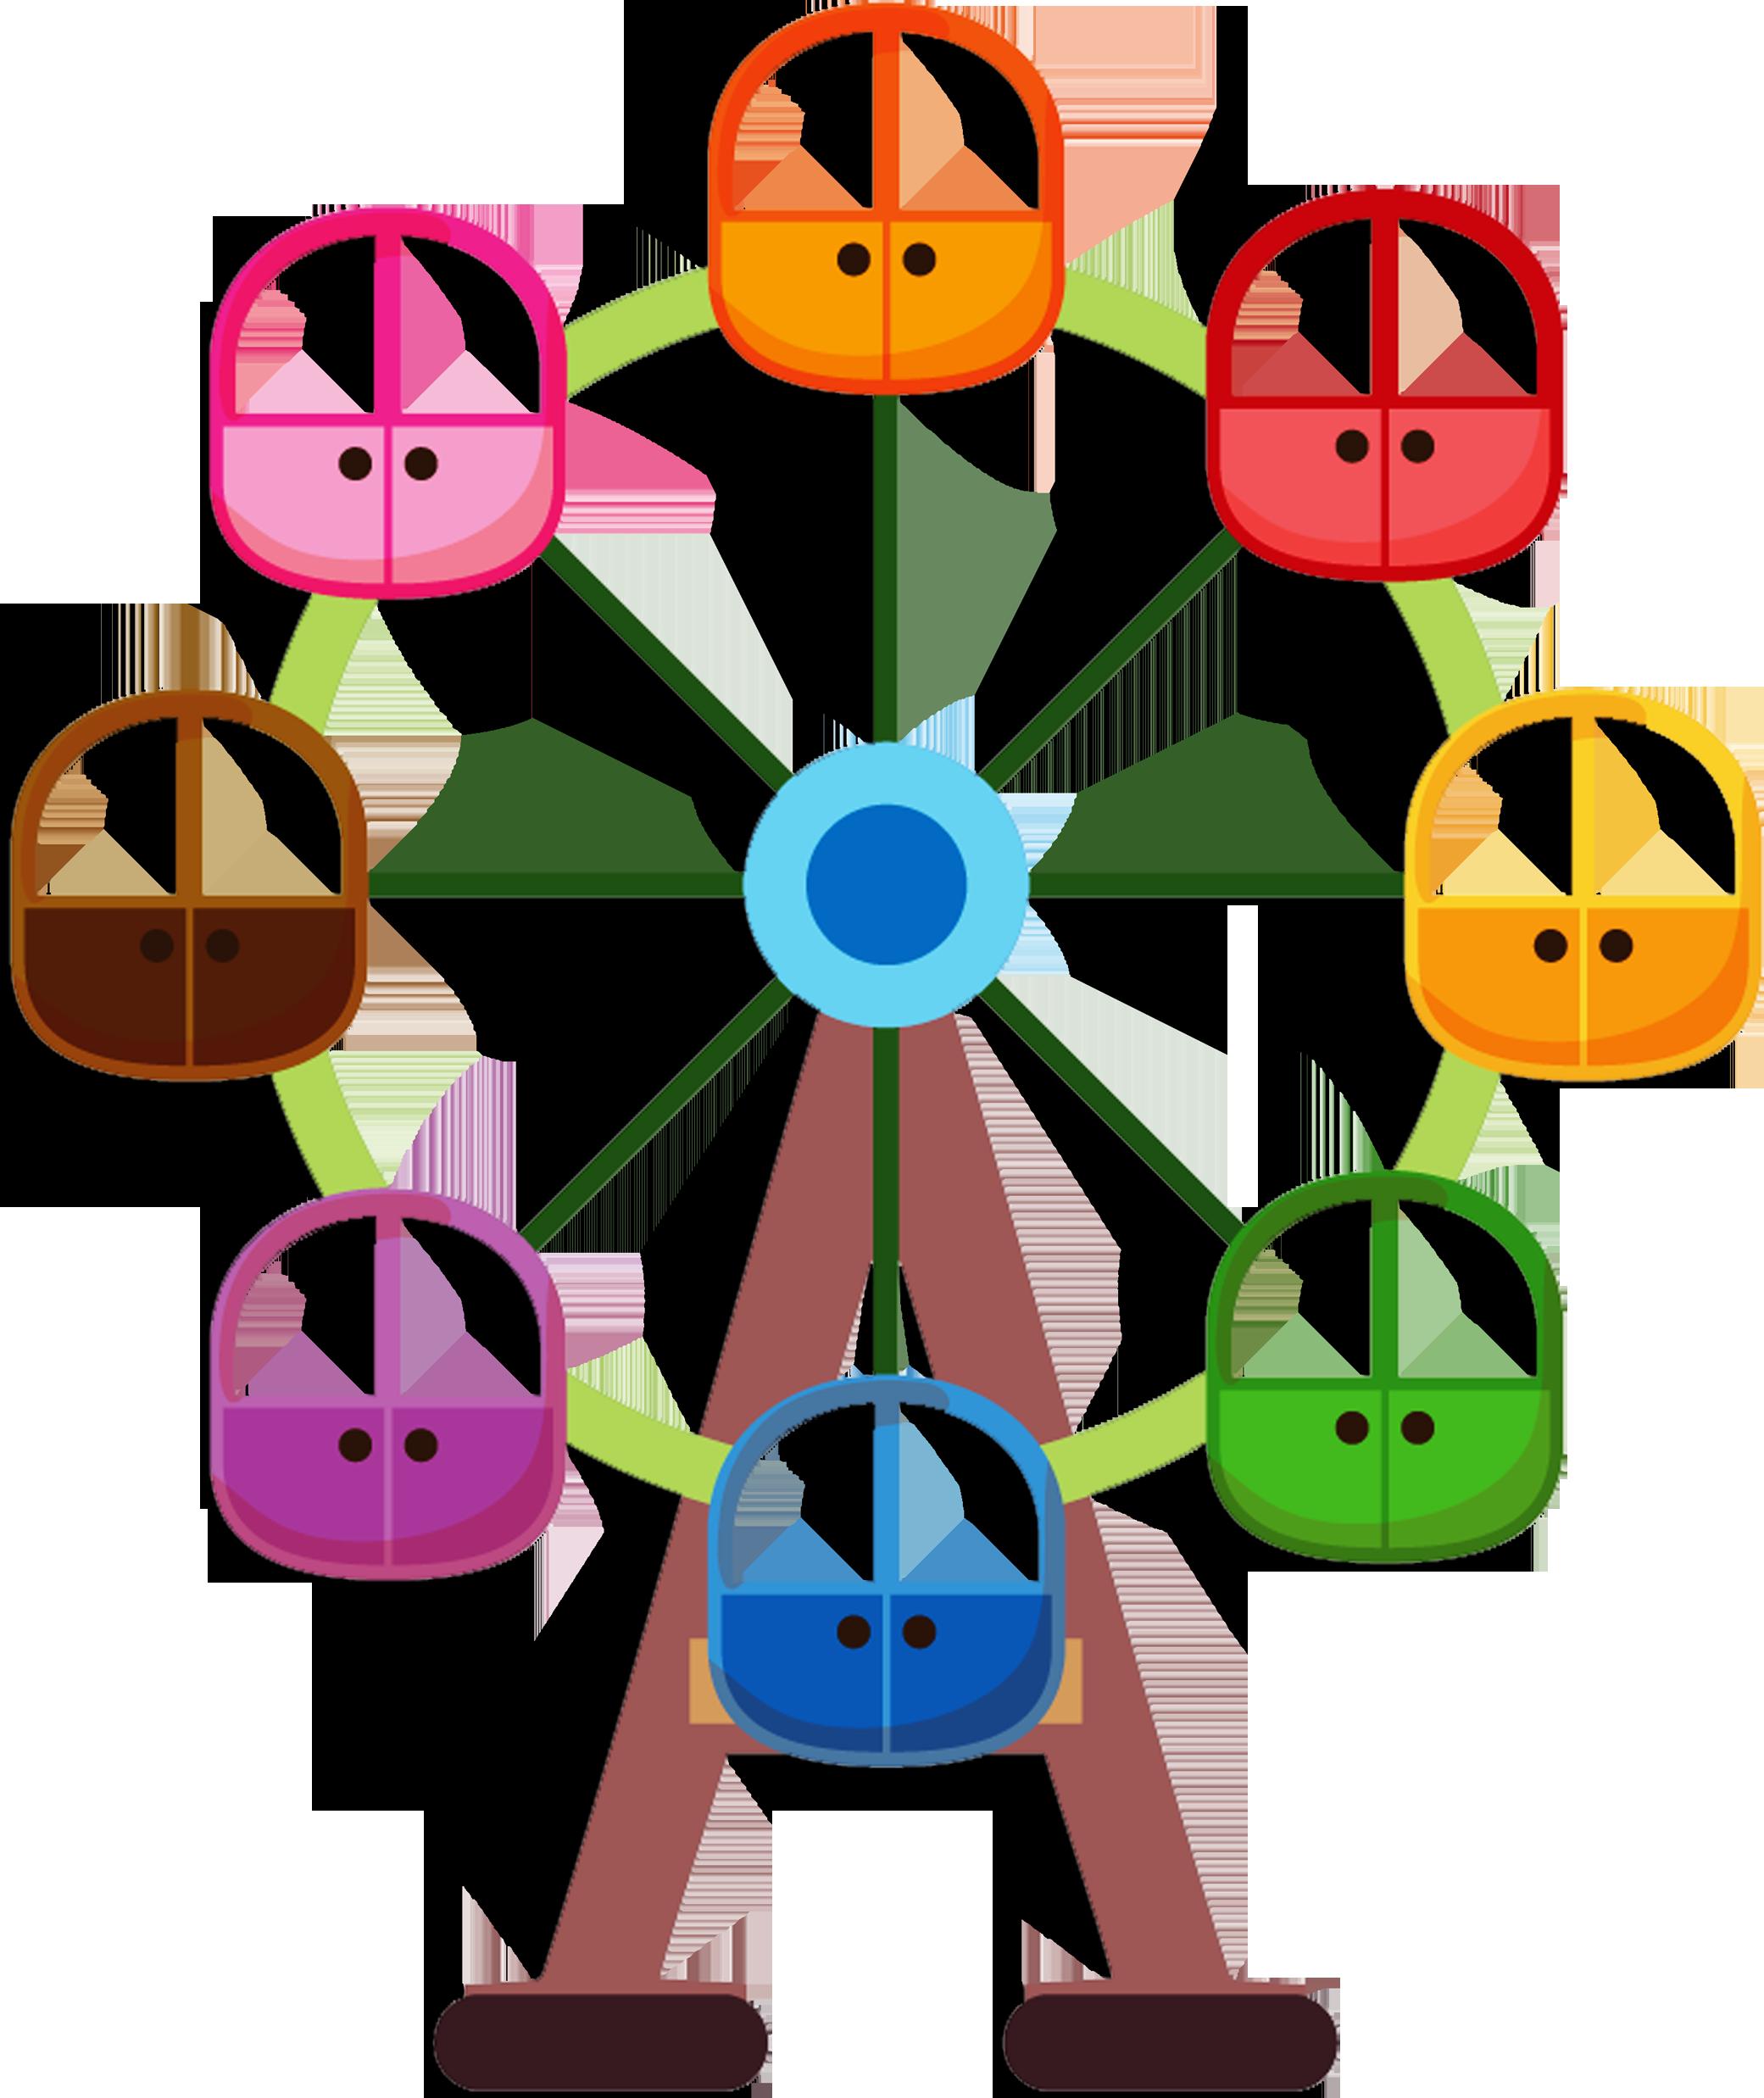 vector freeuse download Circo palha o e. Carnival ferris wheel clipart.